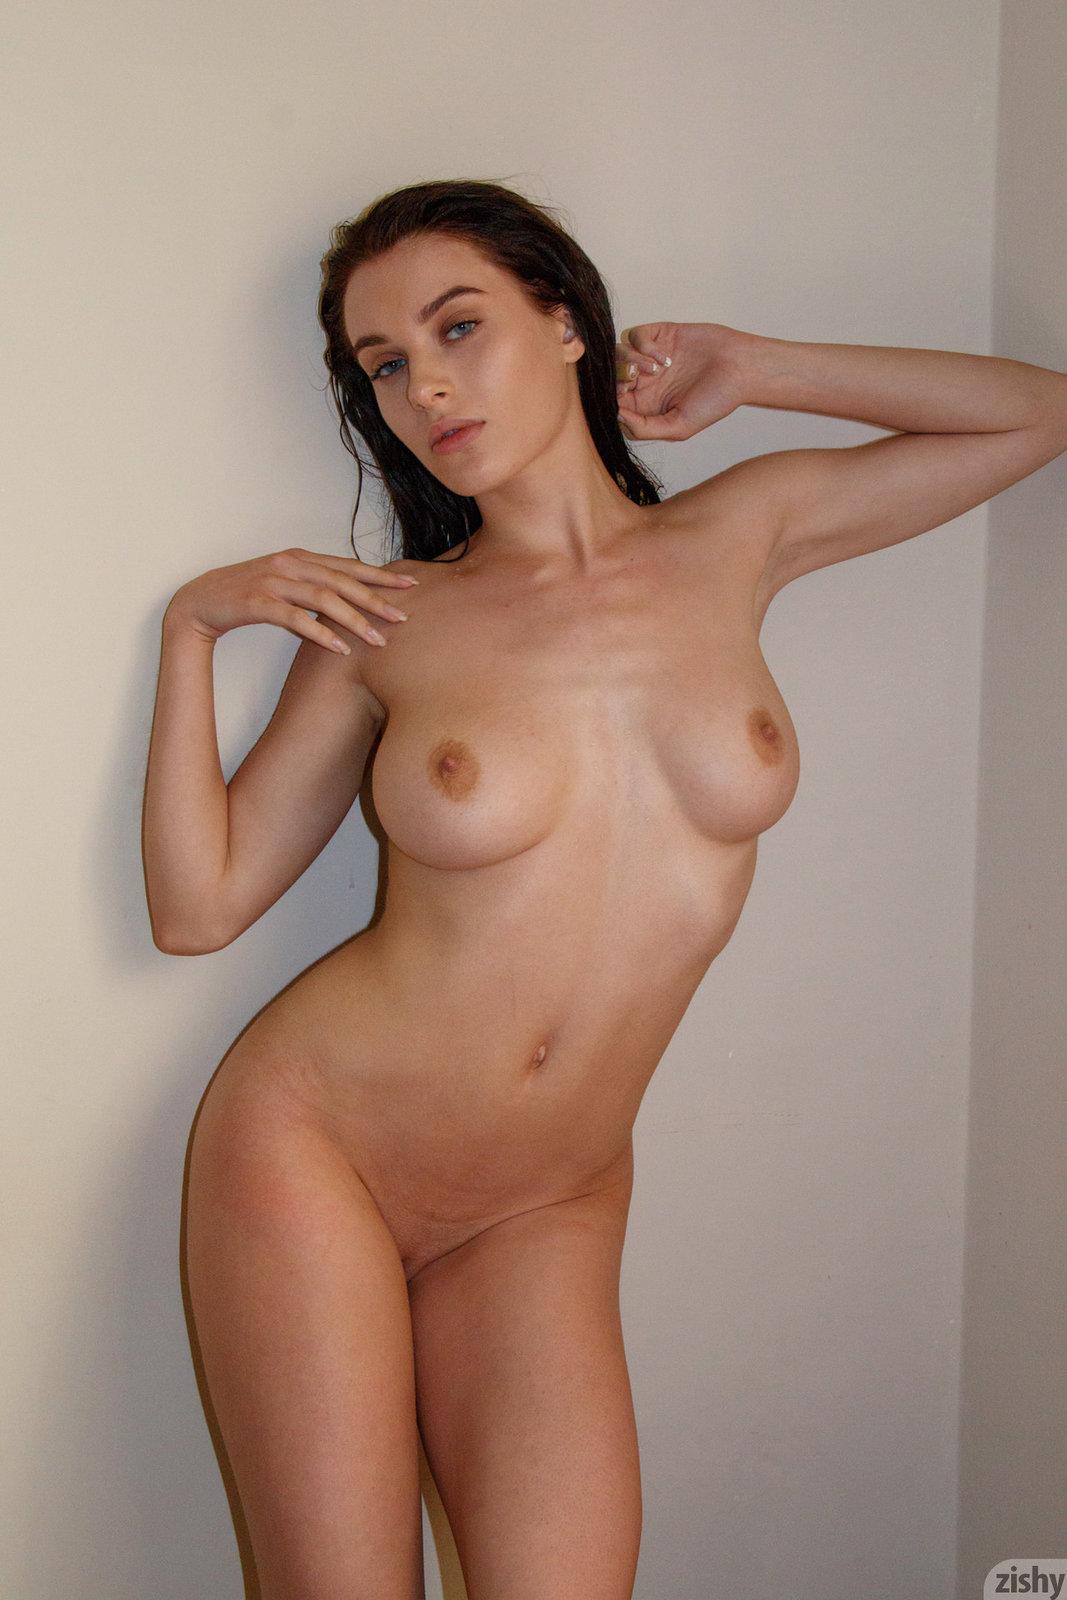 Lana rhoades nake